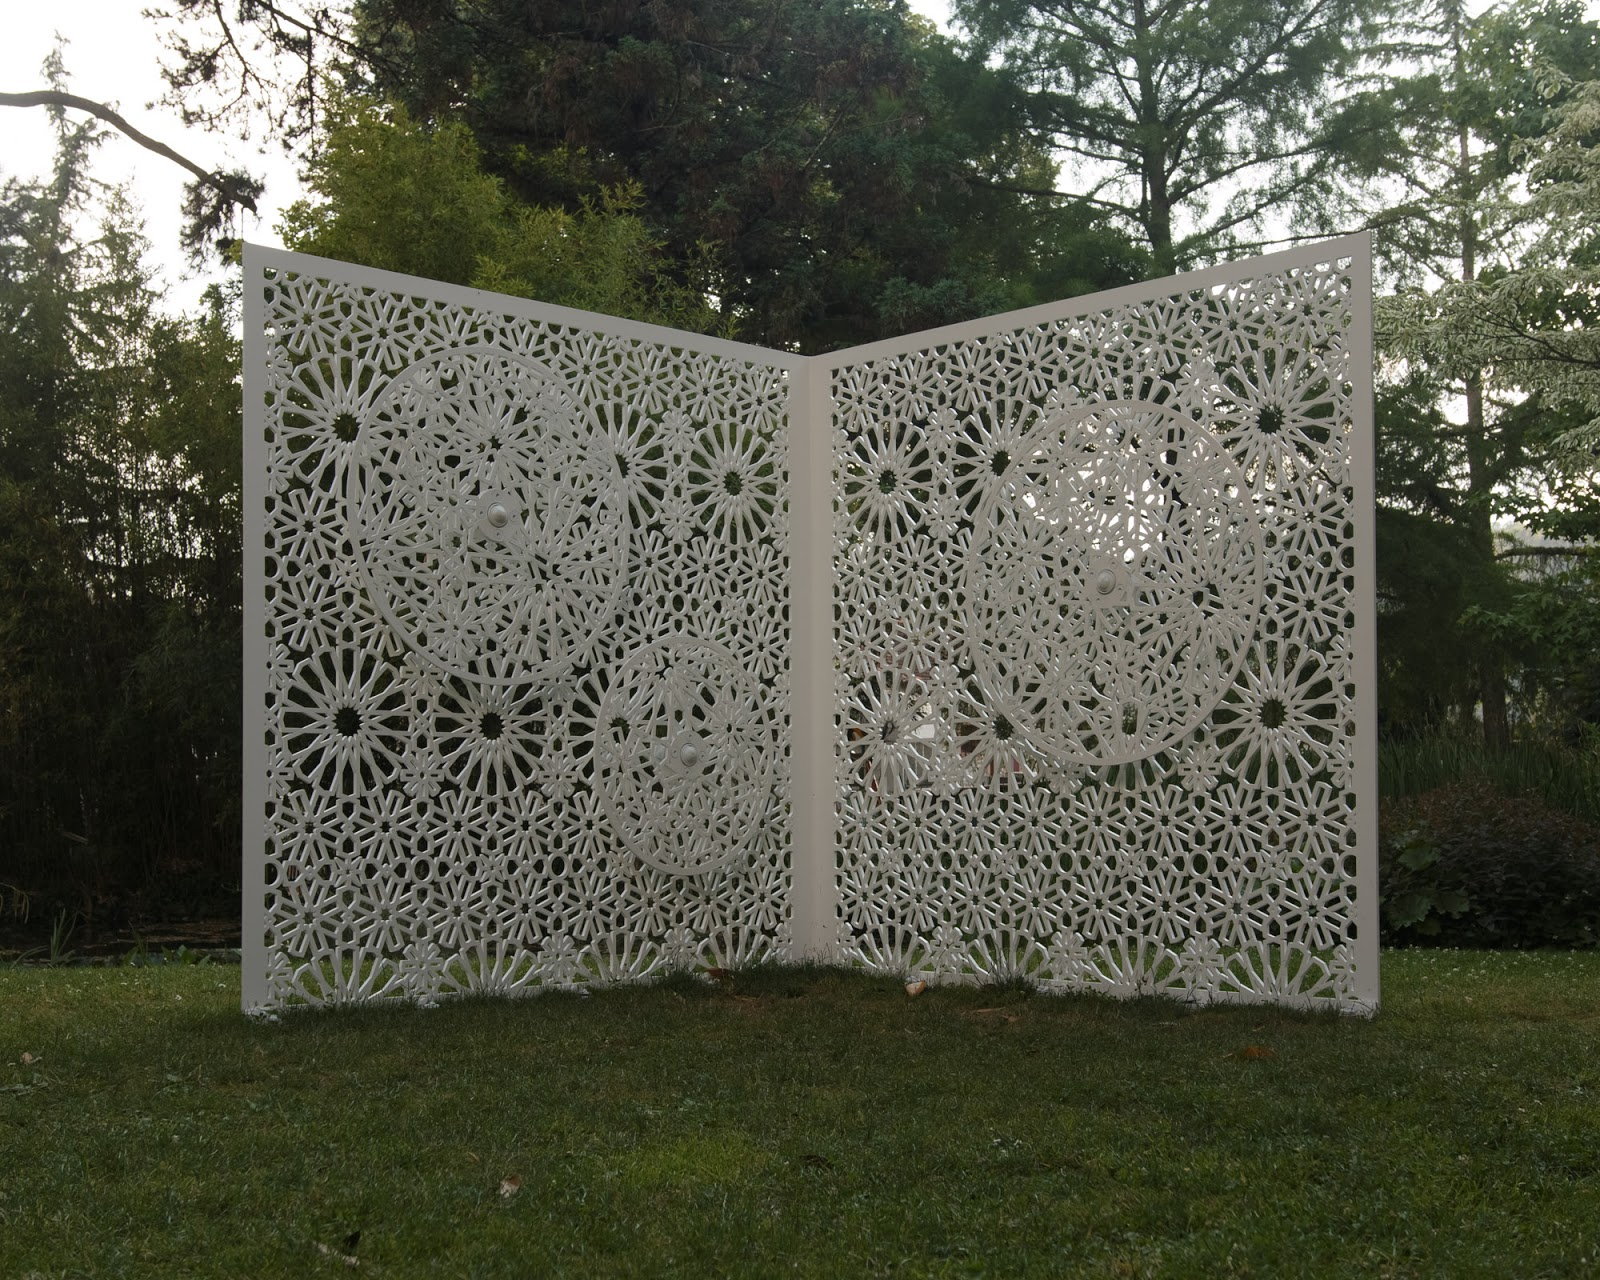 Cahors juin jardins le festival qui cultive l 39 art 2015 for Cahors jardin juin 2015